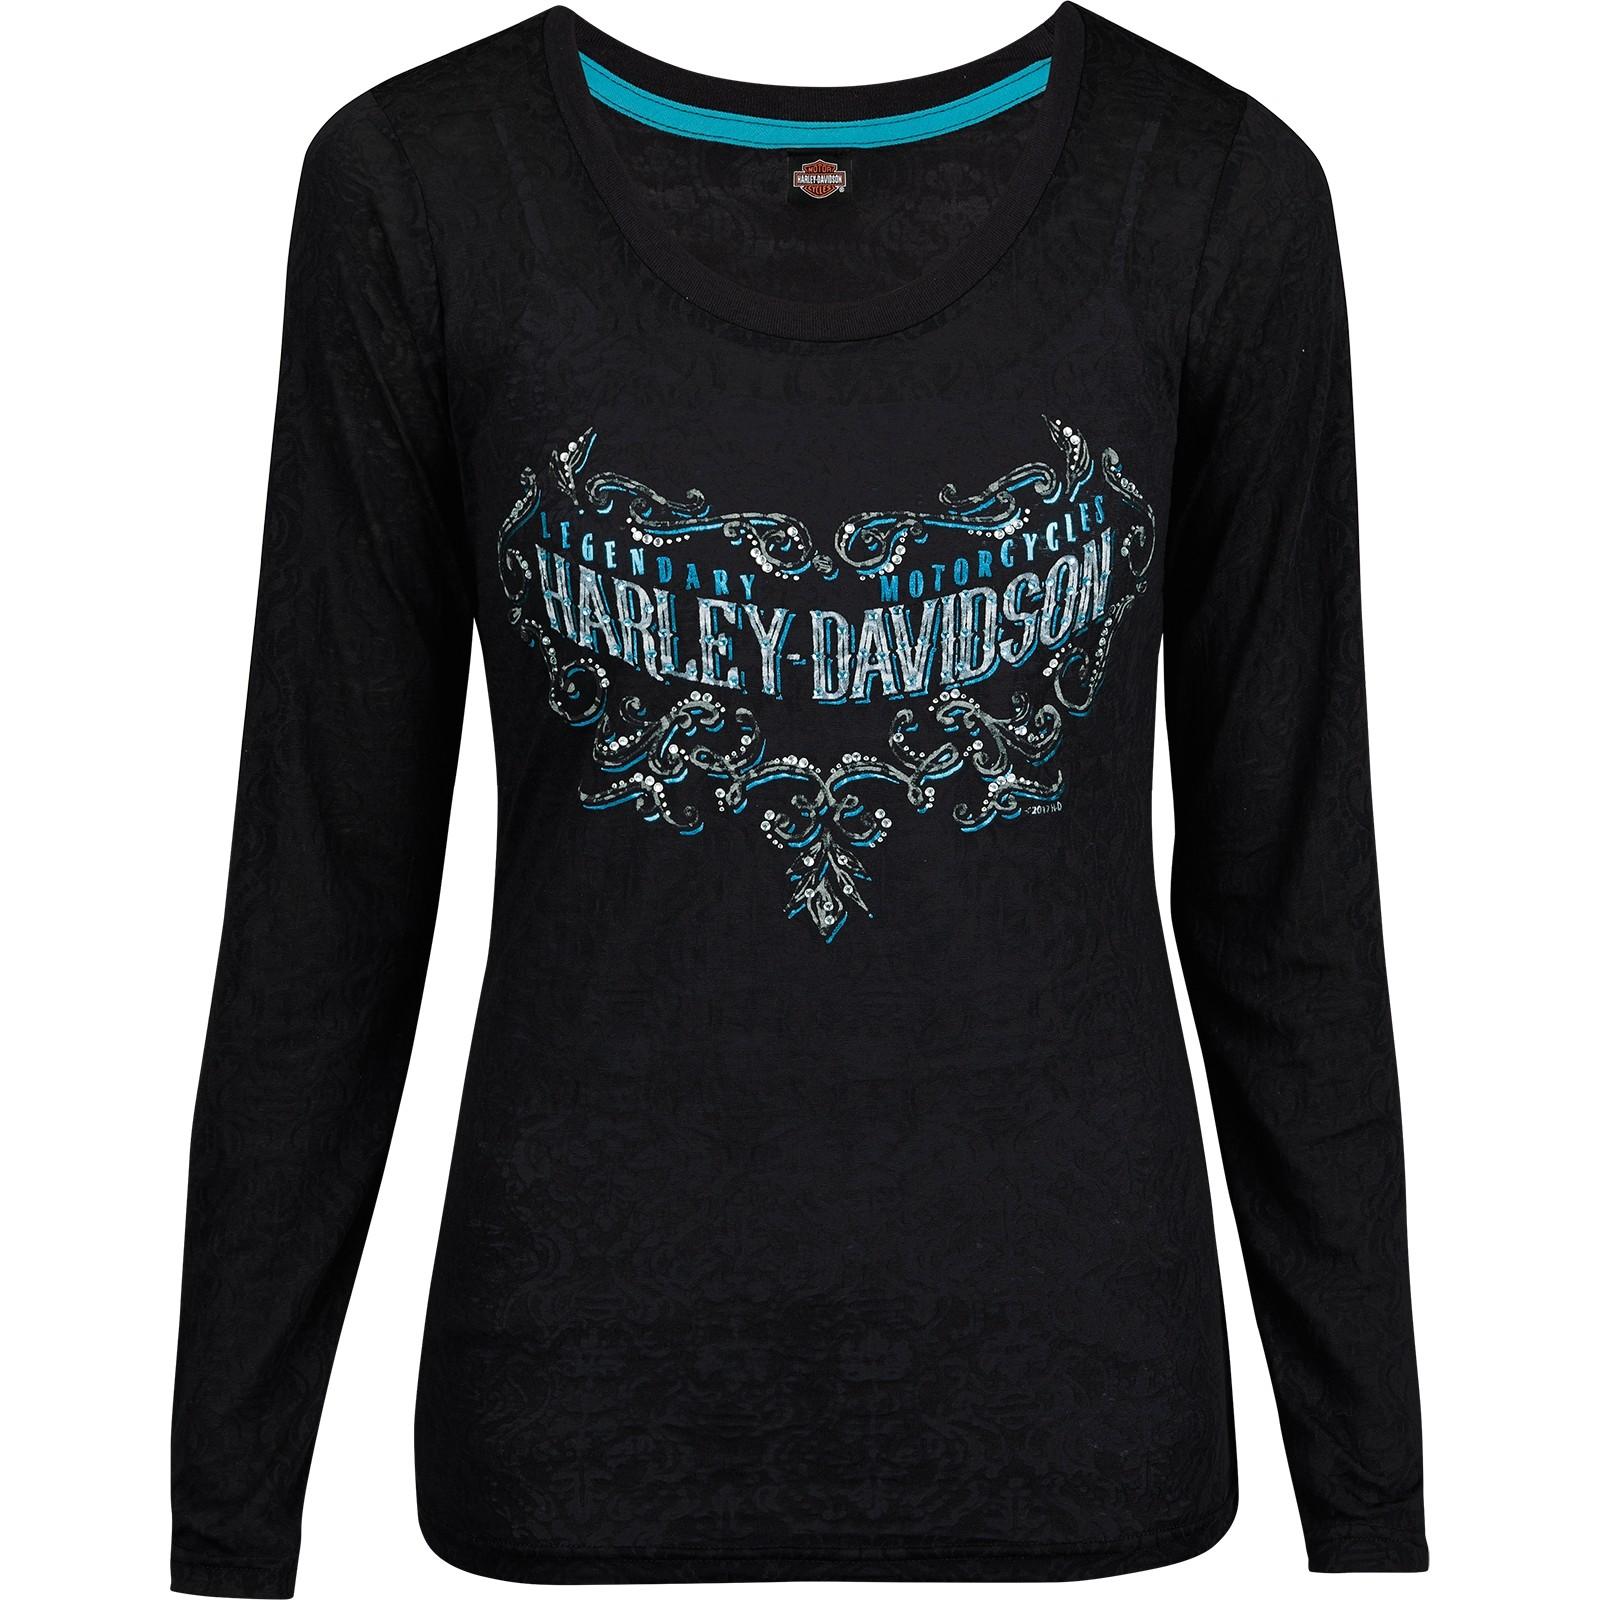 Harley-Davidson Military - Women's Black Long-Sleeve Burnout Graphic T-Shirt - USAG Yongsan | Legend Scroll